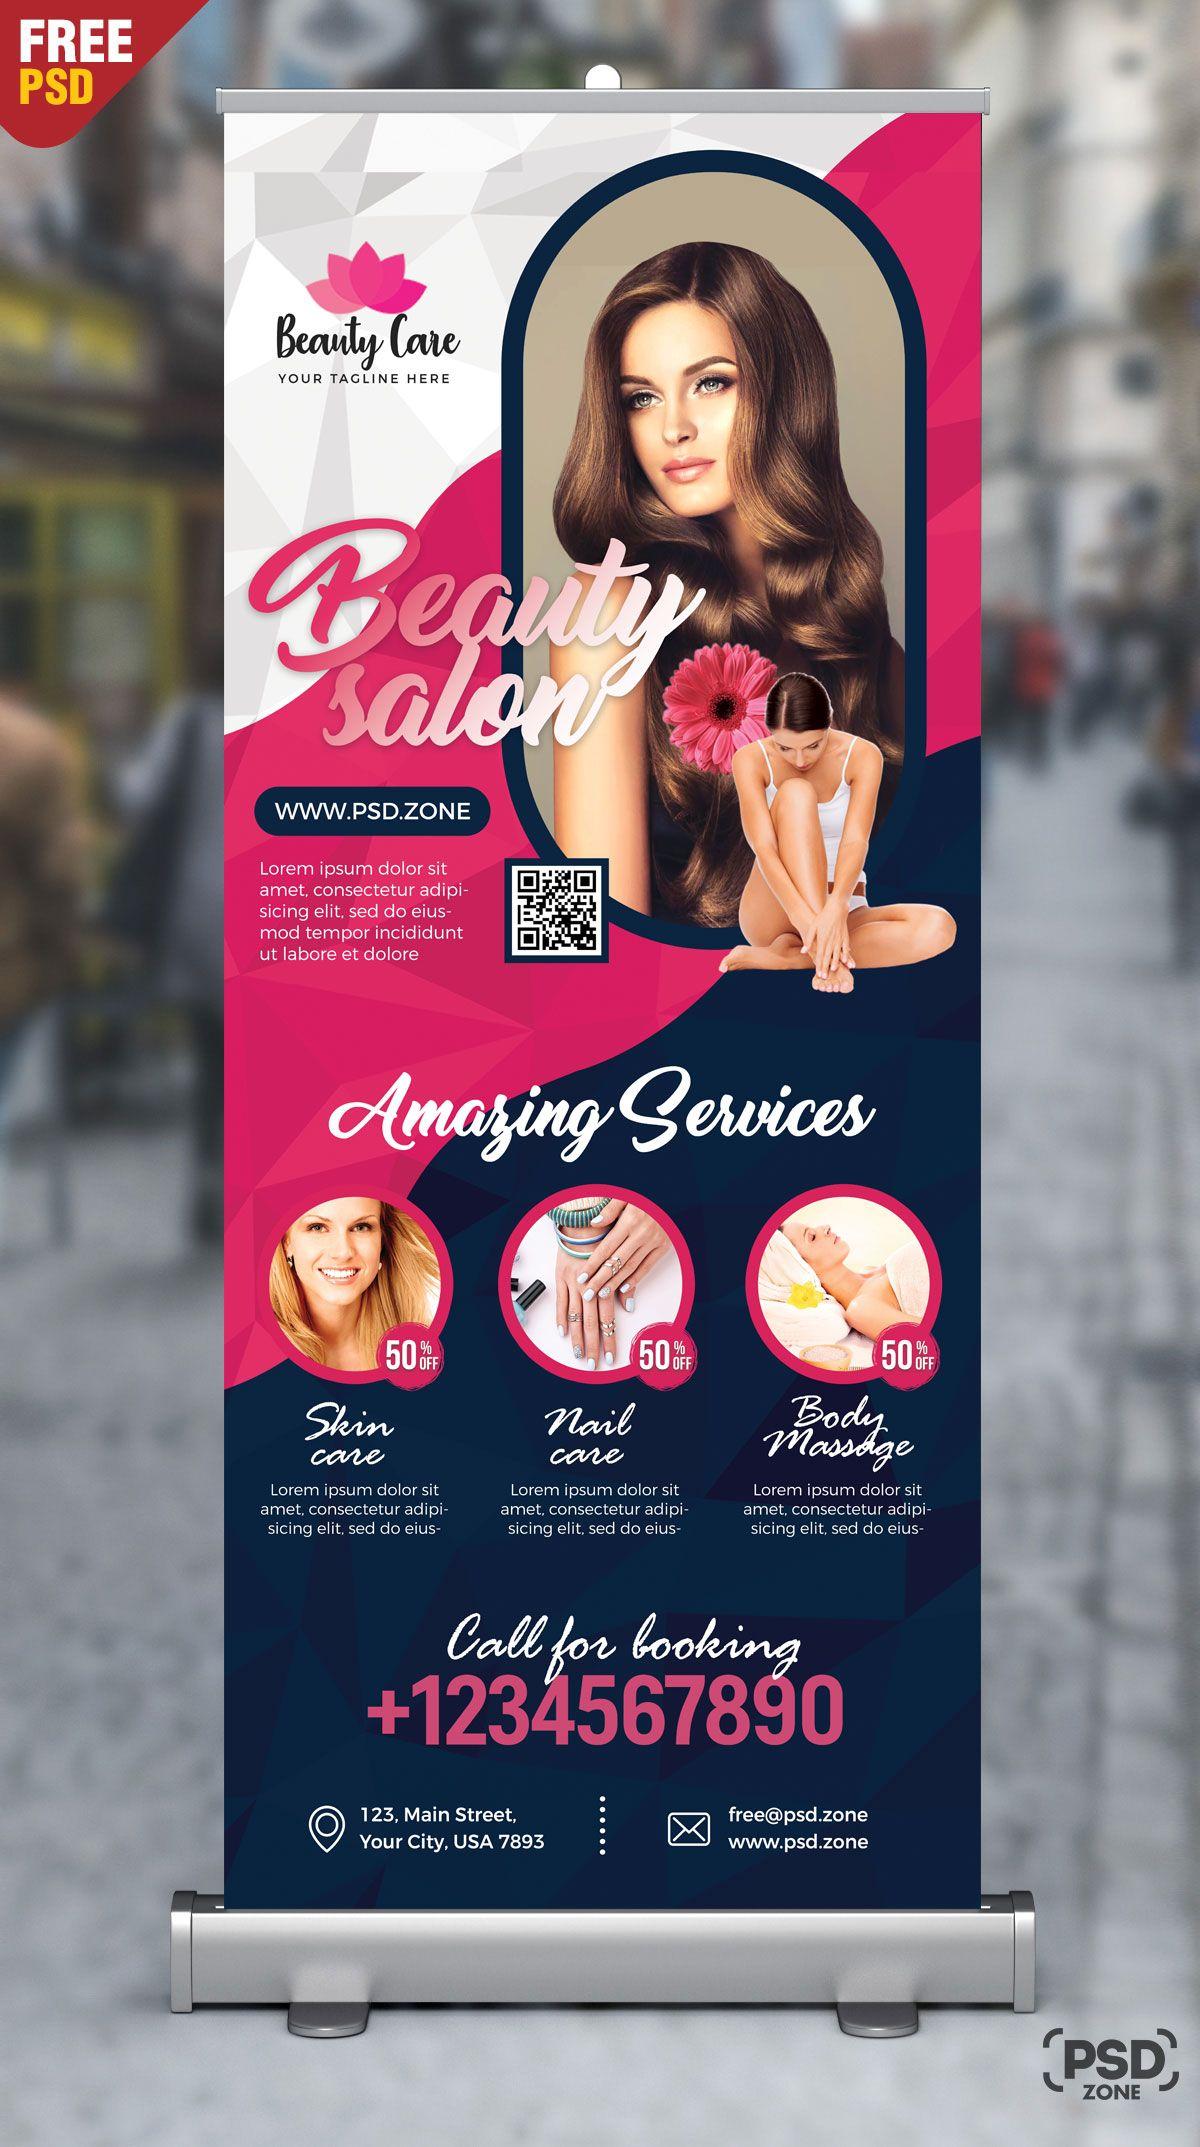 Beauty Salon Roll Up Banner Psd Psd Zone Beauty Salon Posters Beauty Salon Logo Beauty Salon Design